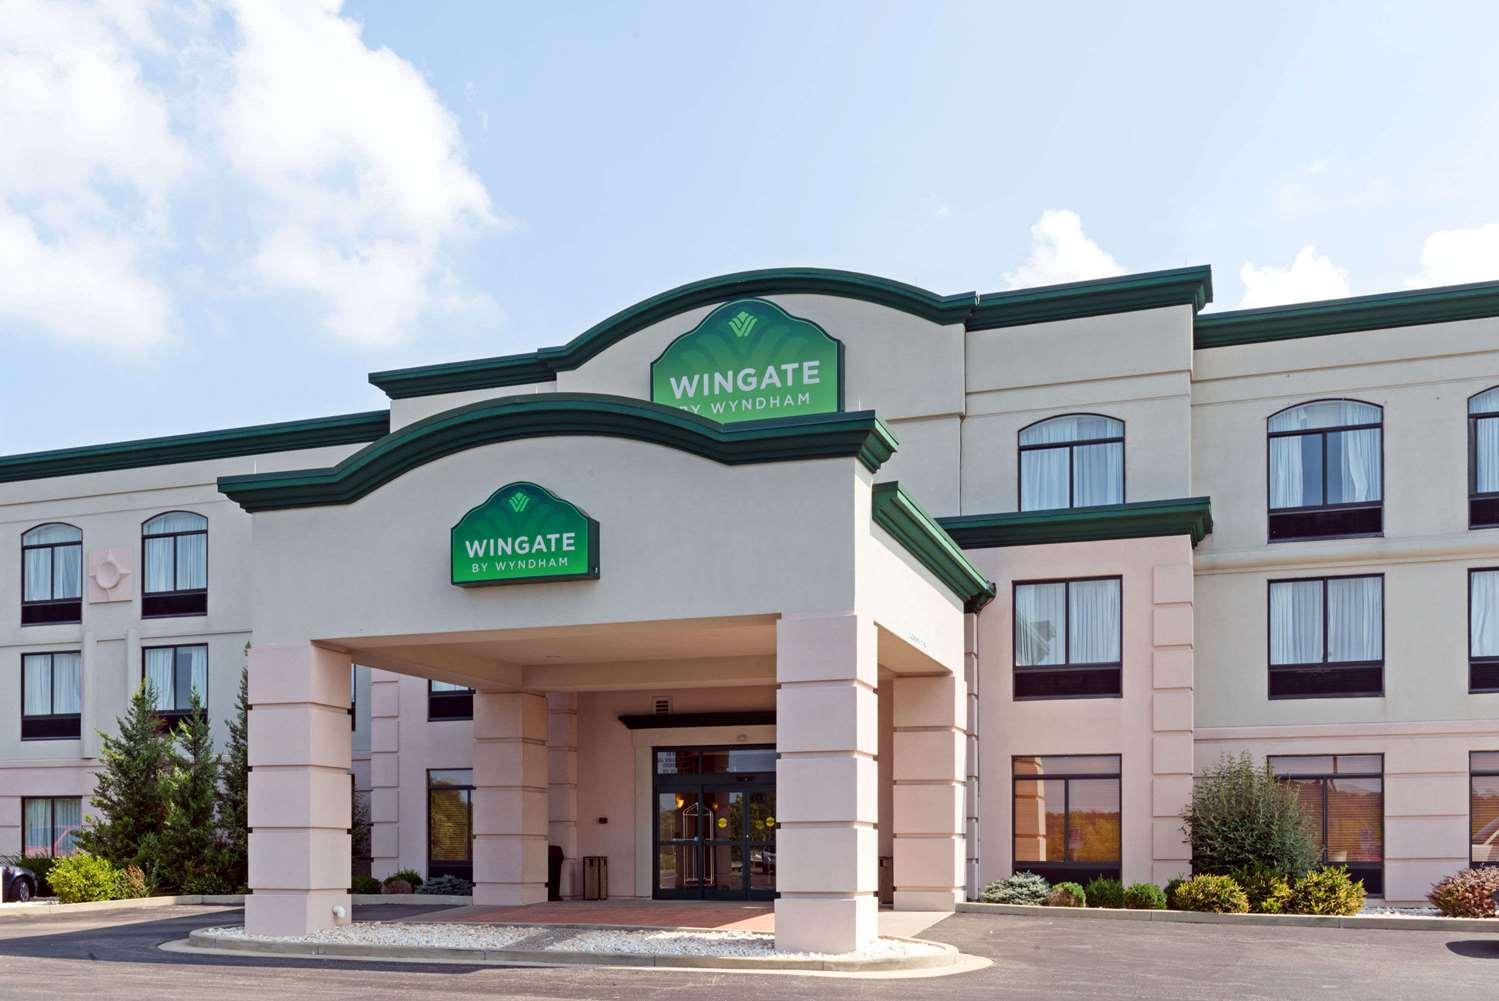 Exterior view - Wingate by Wyndham Hotel Cincinnati Airport Erlanger